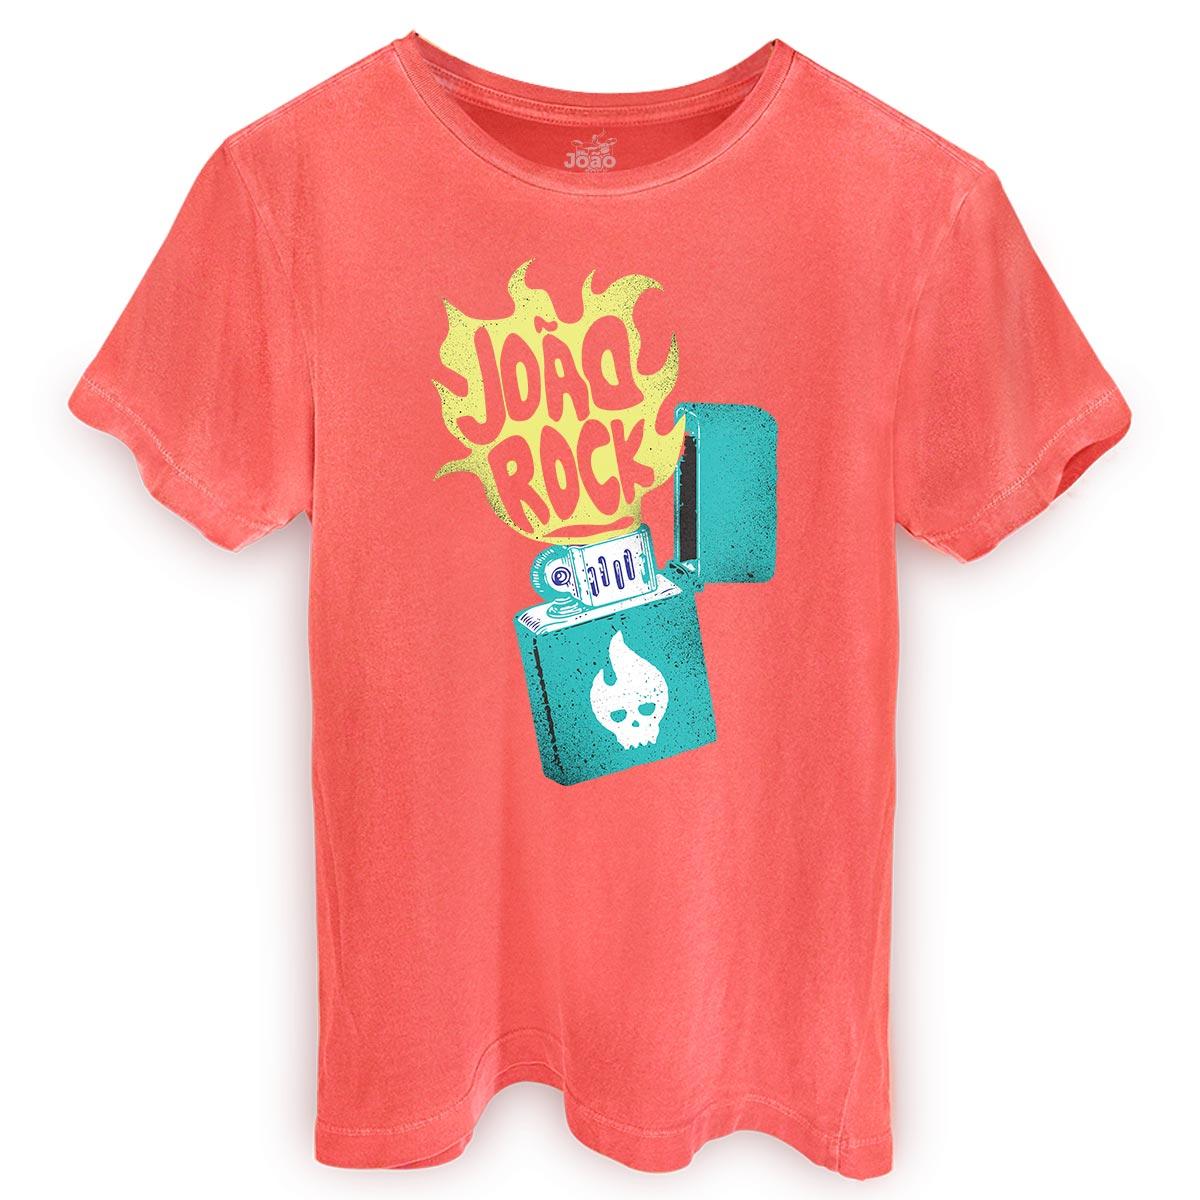 T-shirt Premium Masculina João Rock Isqueiro